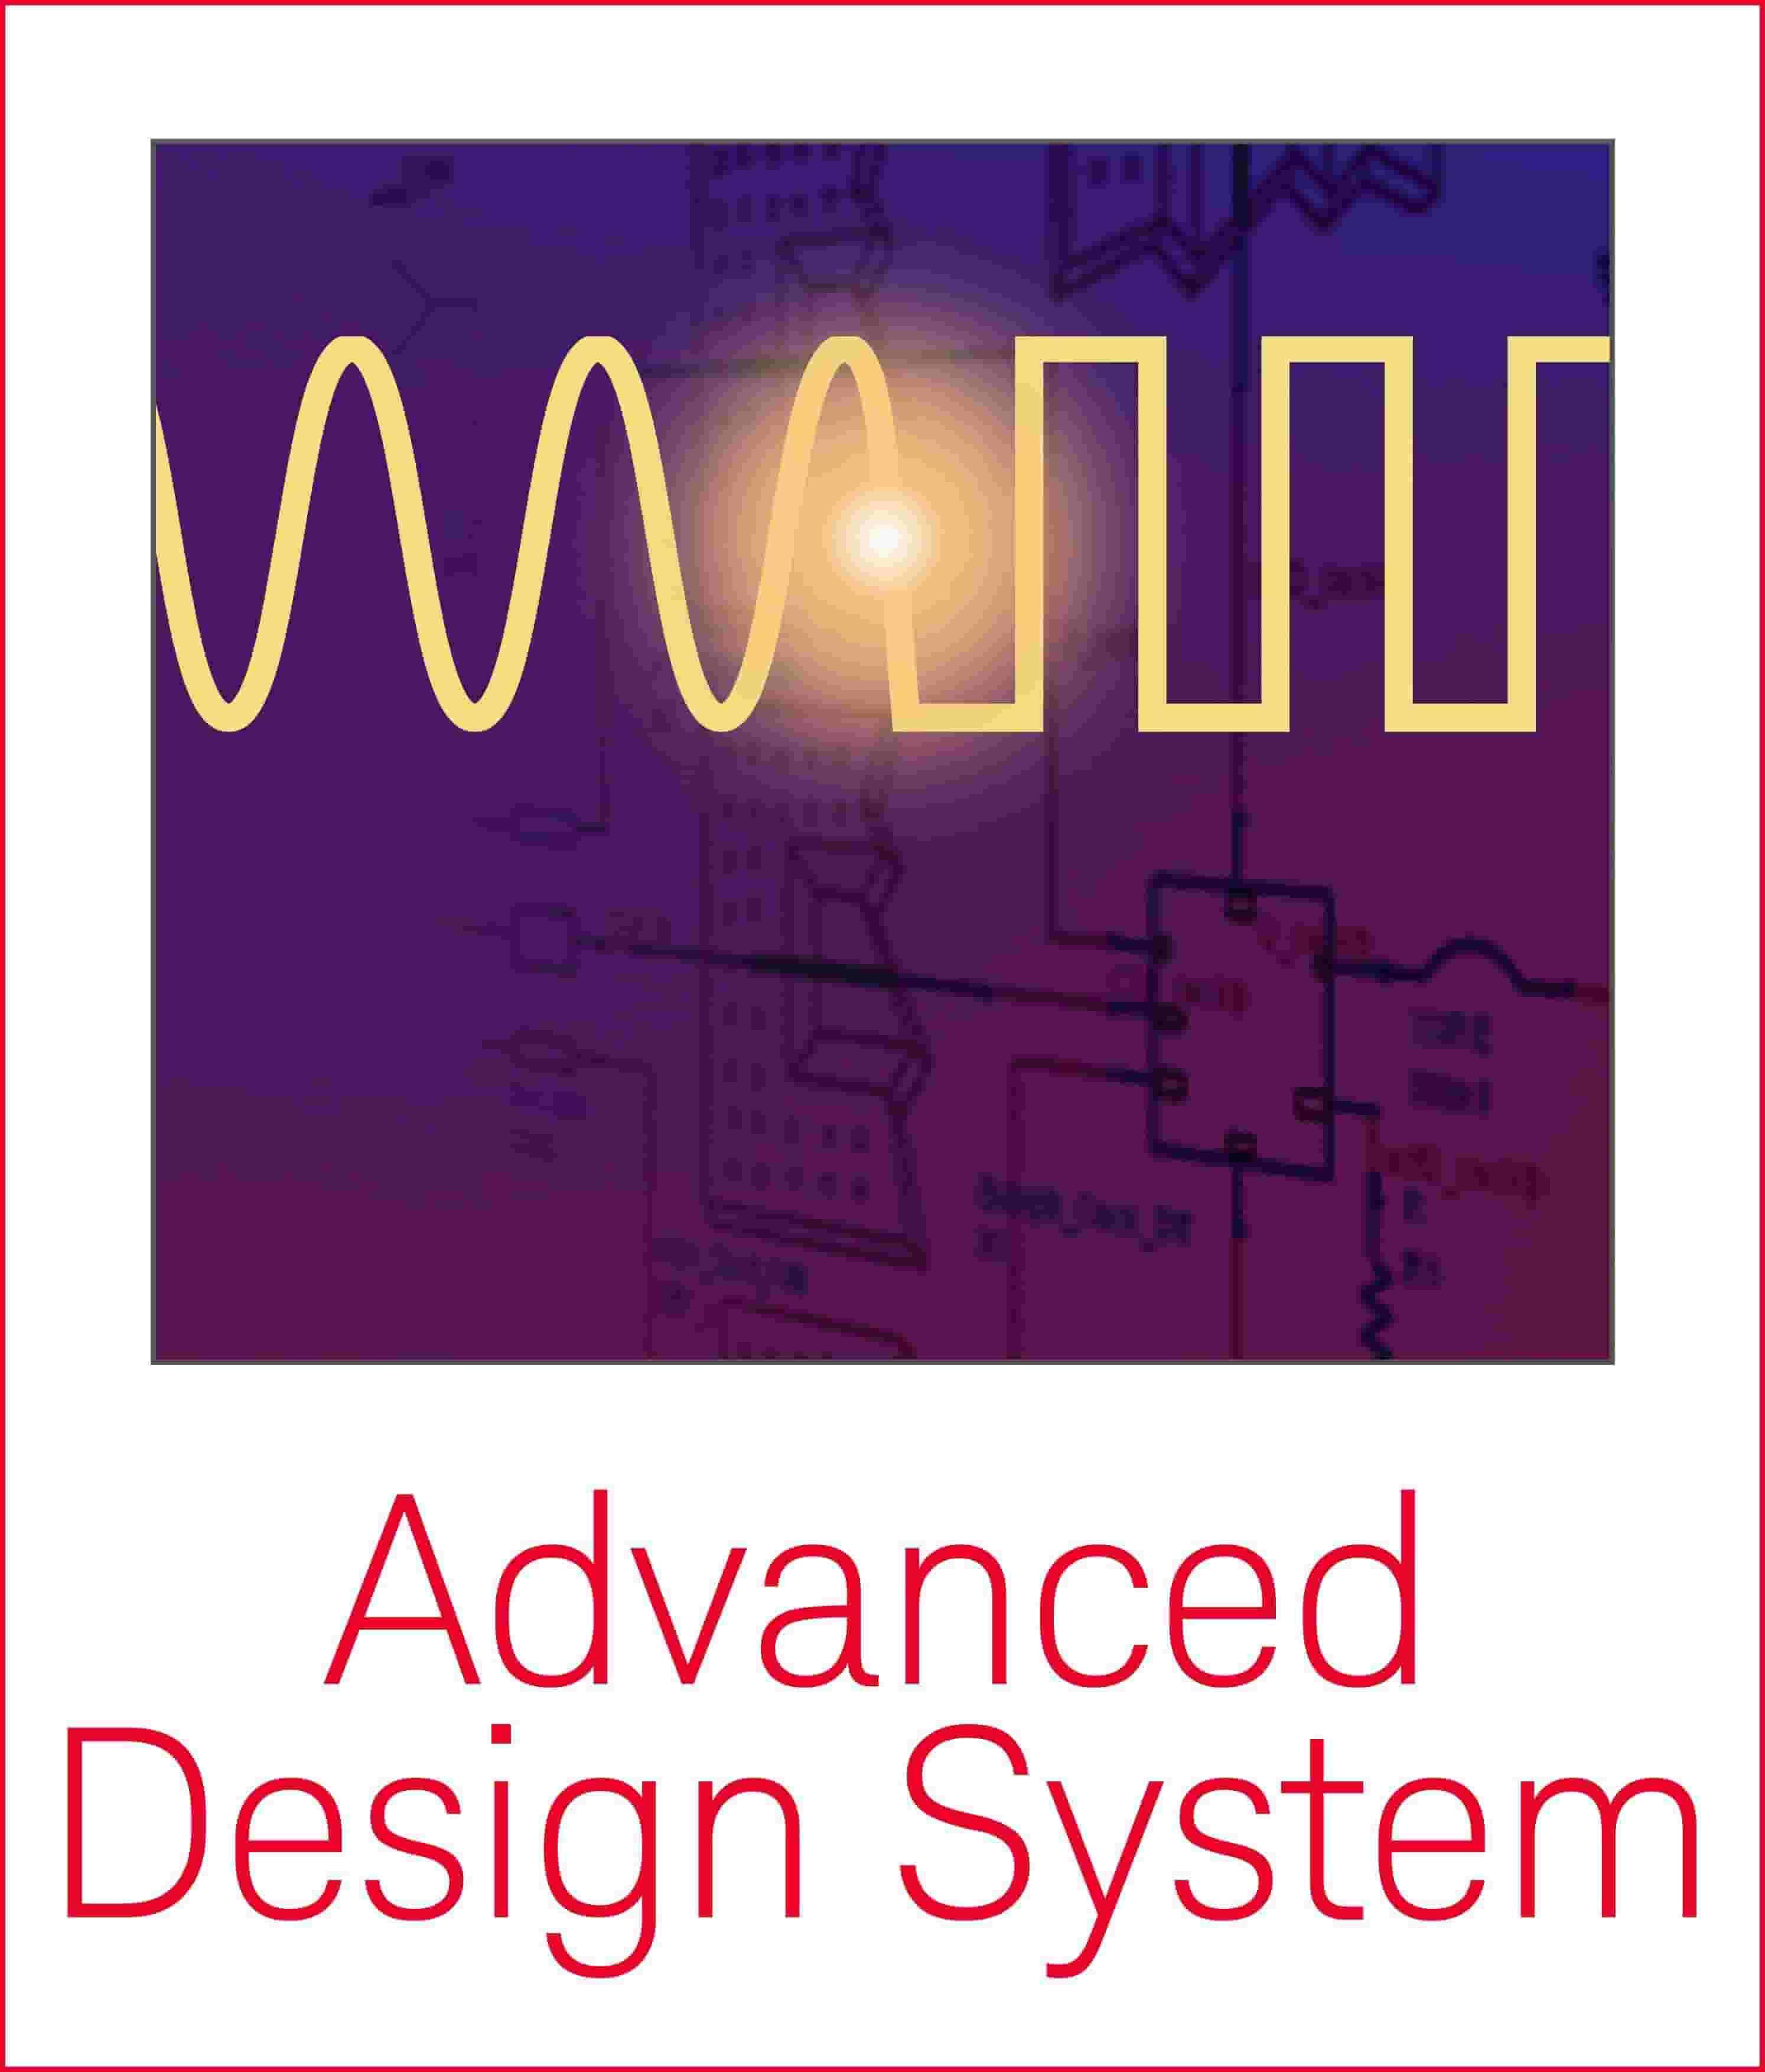 Keysight Advanced Design System (ADS) 2019 full license